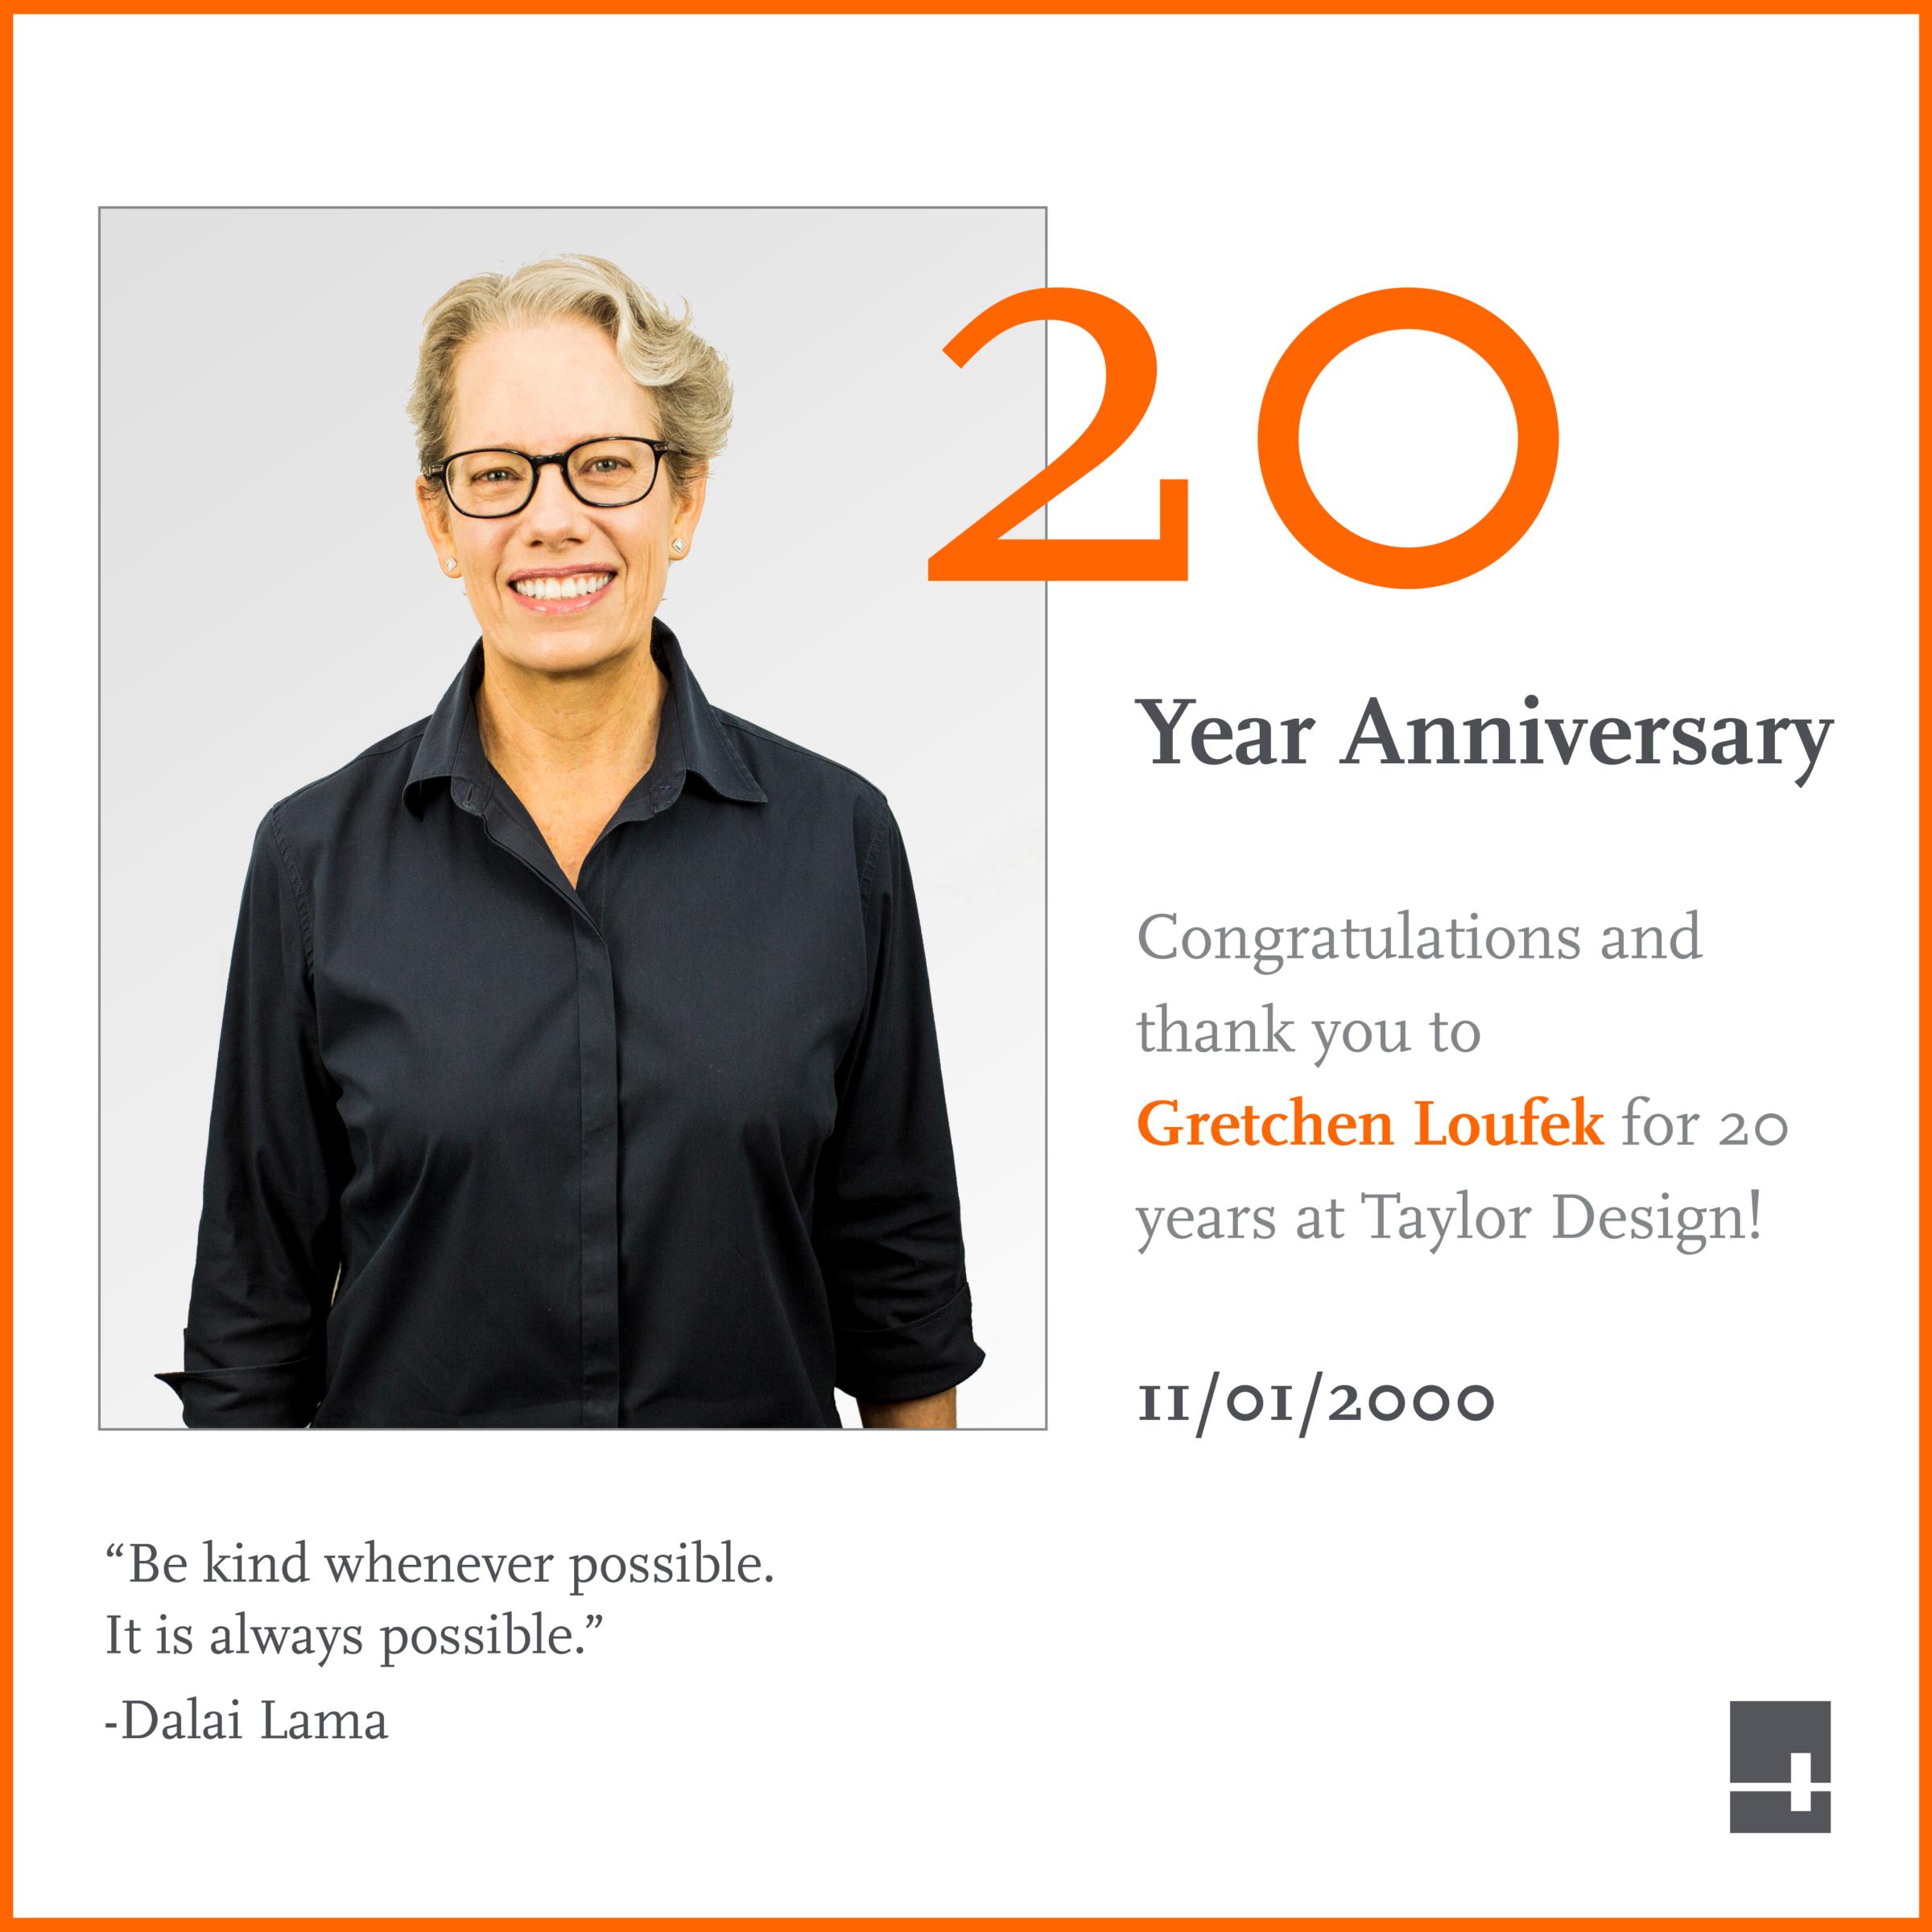 Gretchen Loufek 20th Anniversary